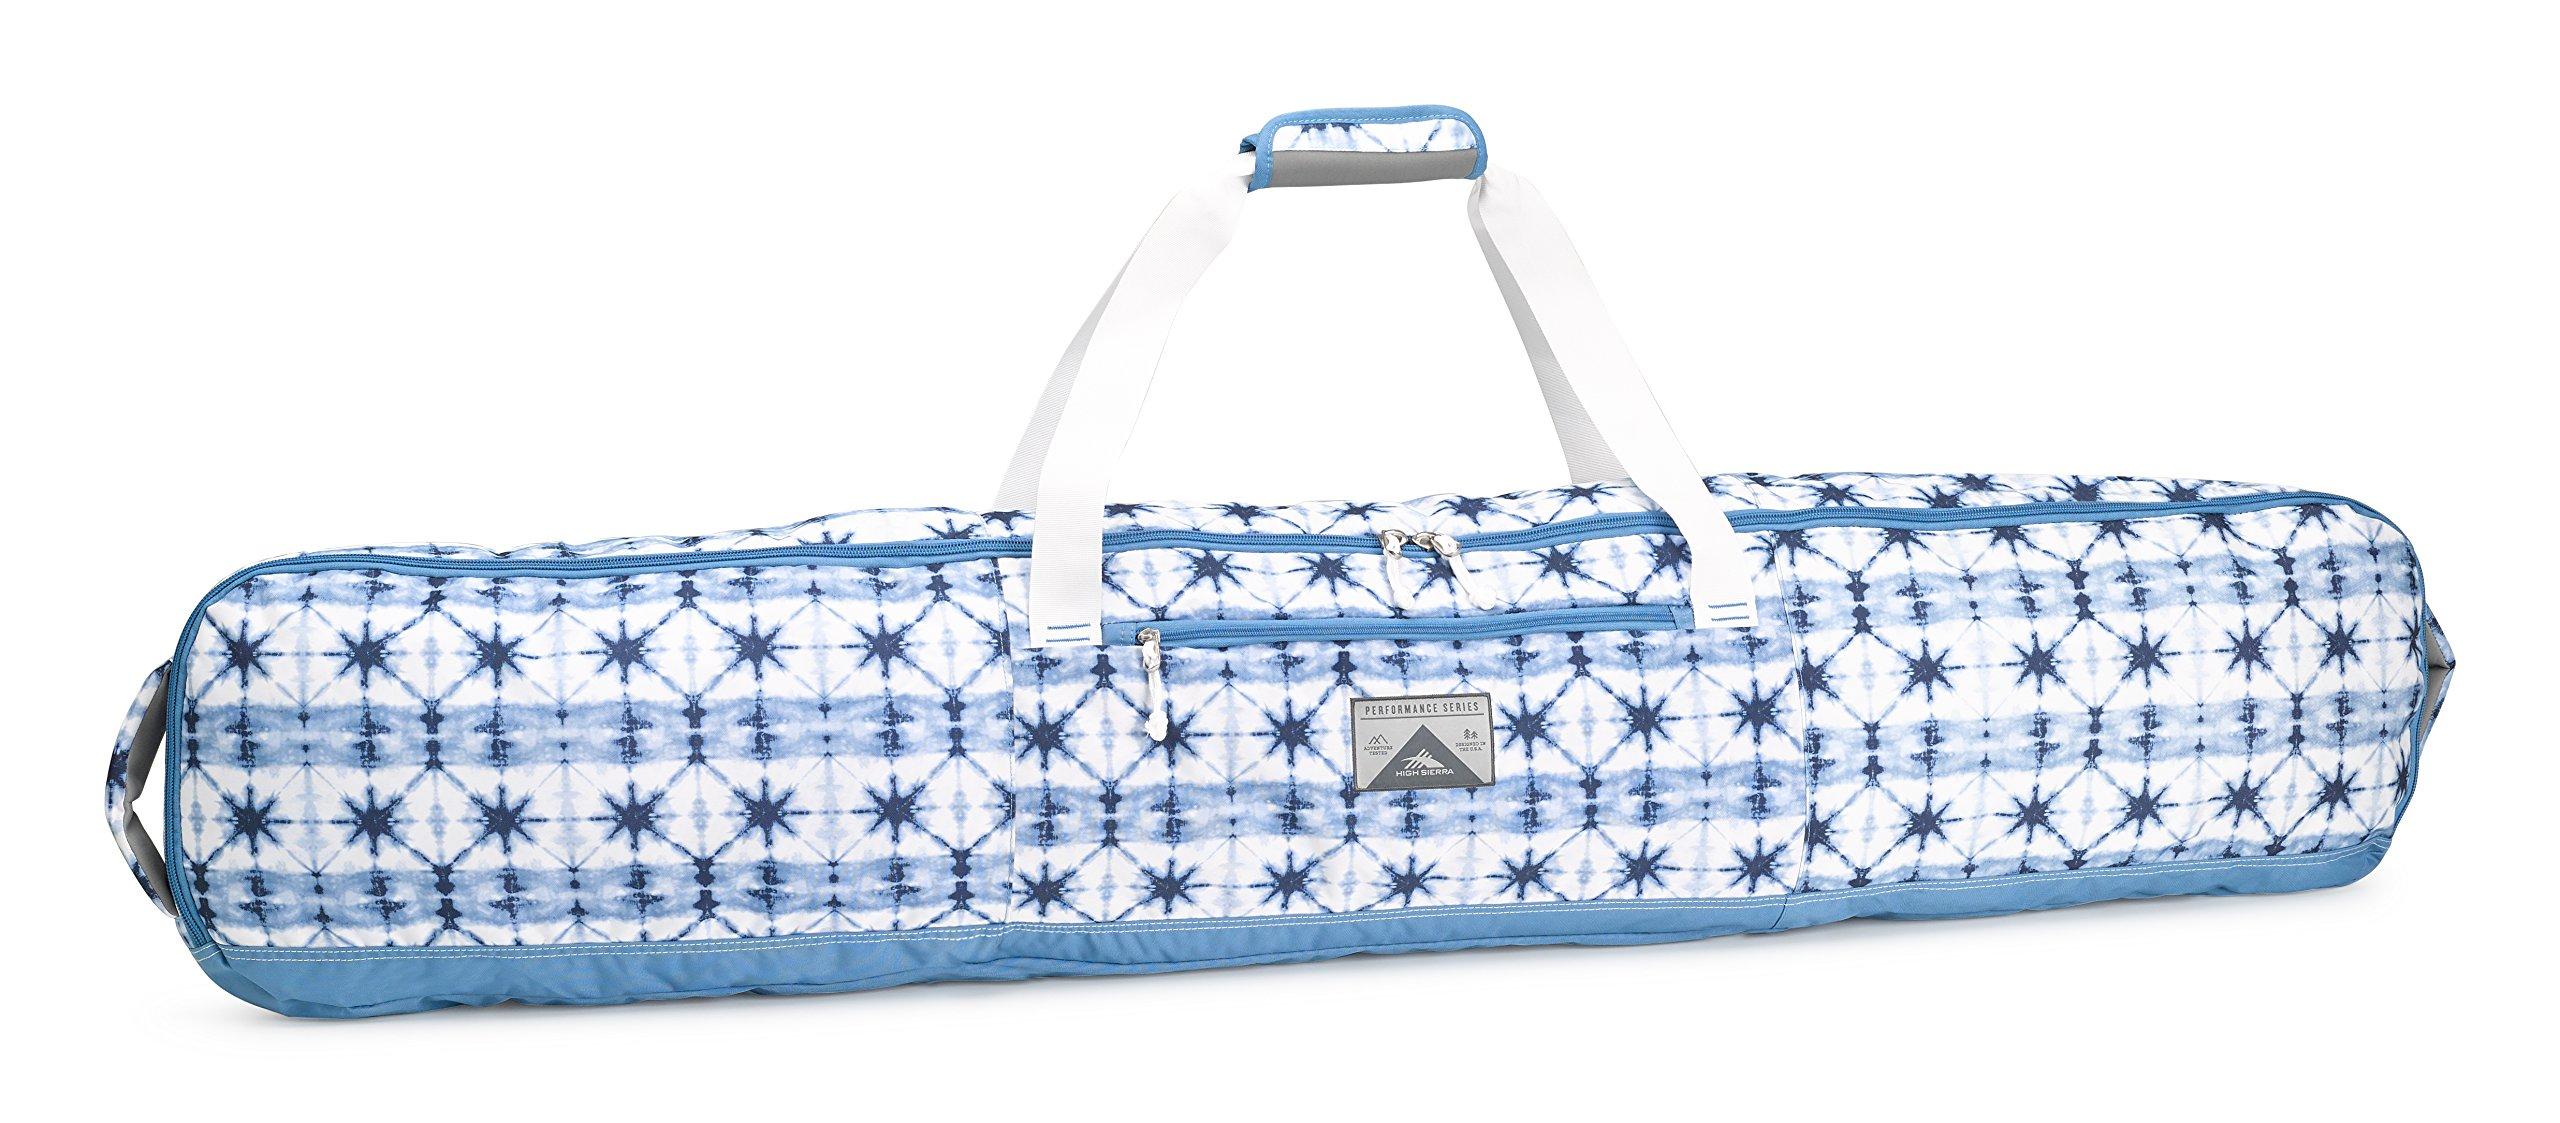 High Sierra Padded Snowboard Bag, Indigo Dye/Mineral/White